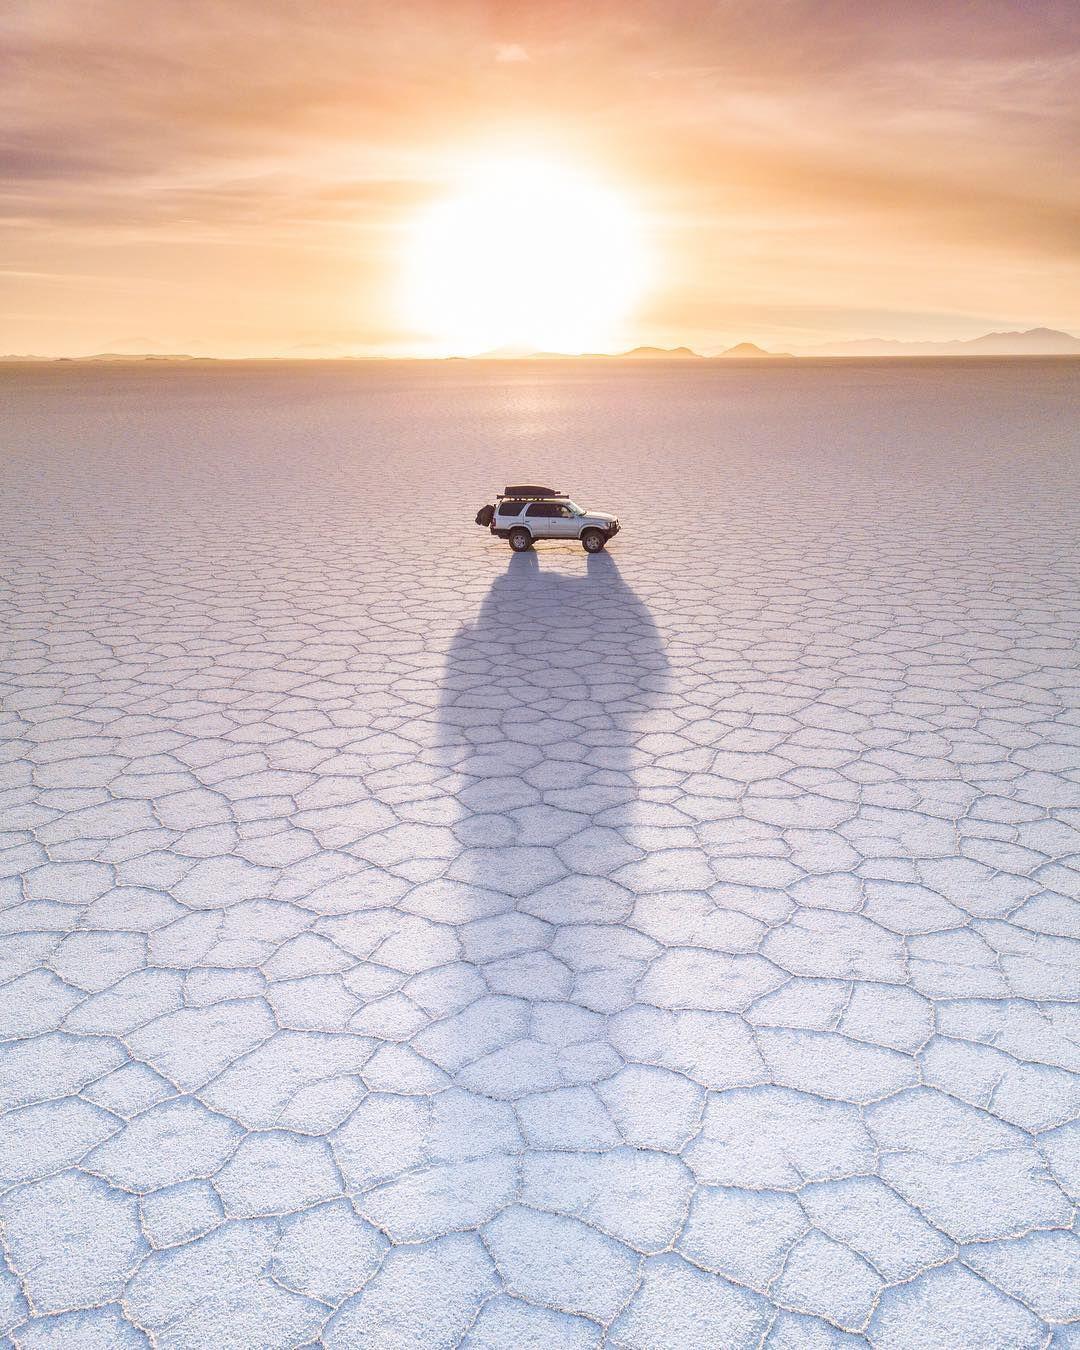 Geometric Shapes In The Salt Of The Great Salar De Uyuni Bolivia Photo Ashwin Atre Aatre Bolivia Southamerica Travel Spot Virtuoso Travel Places To Go